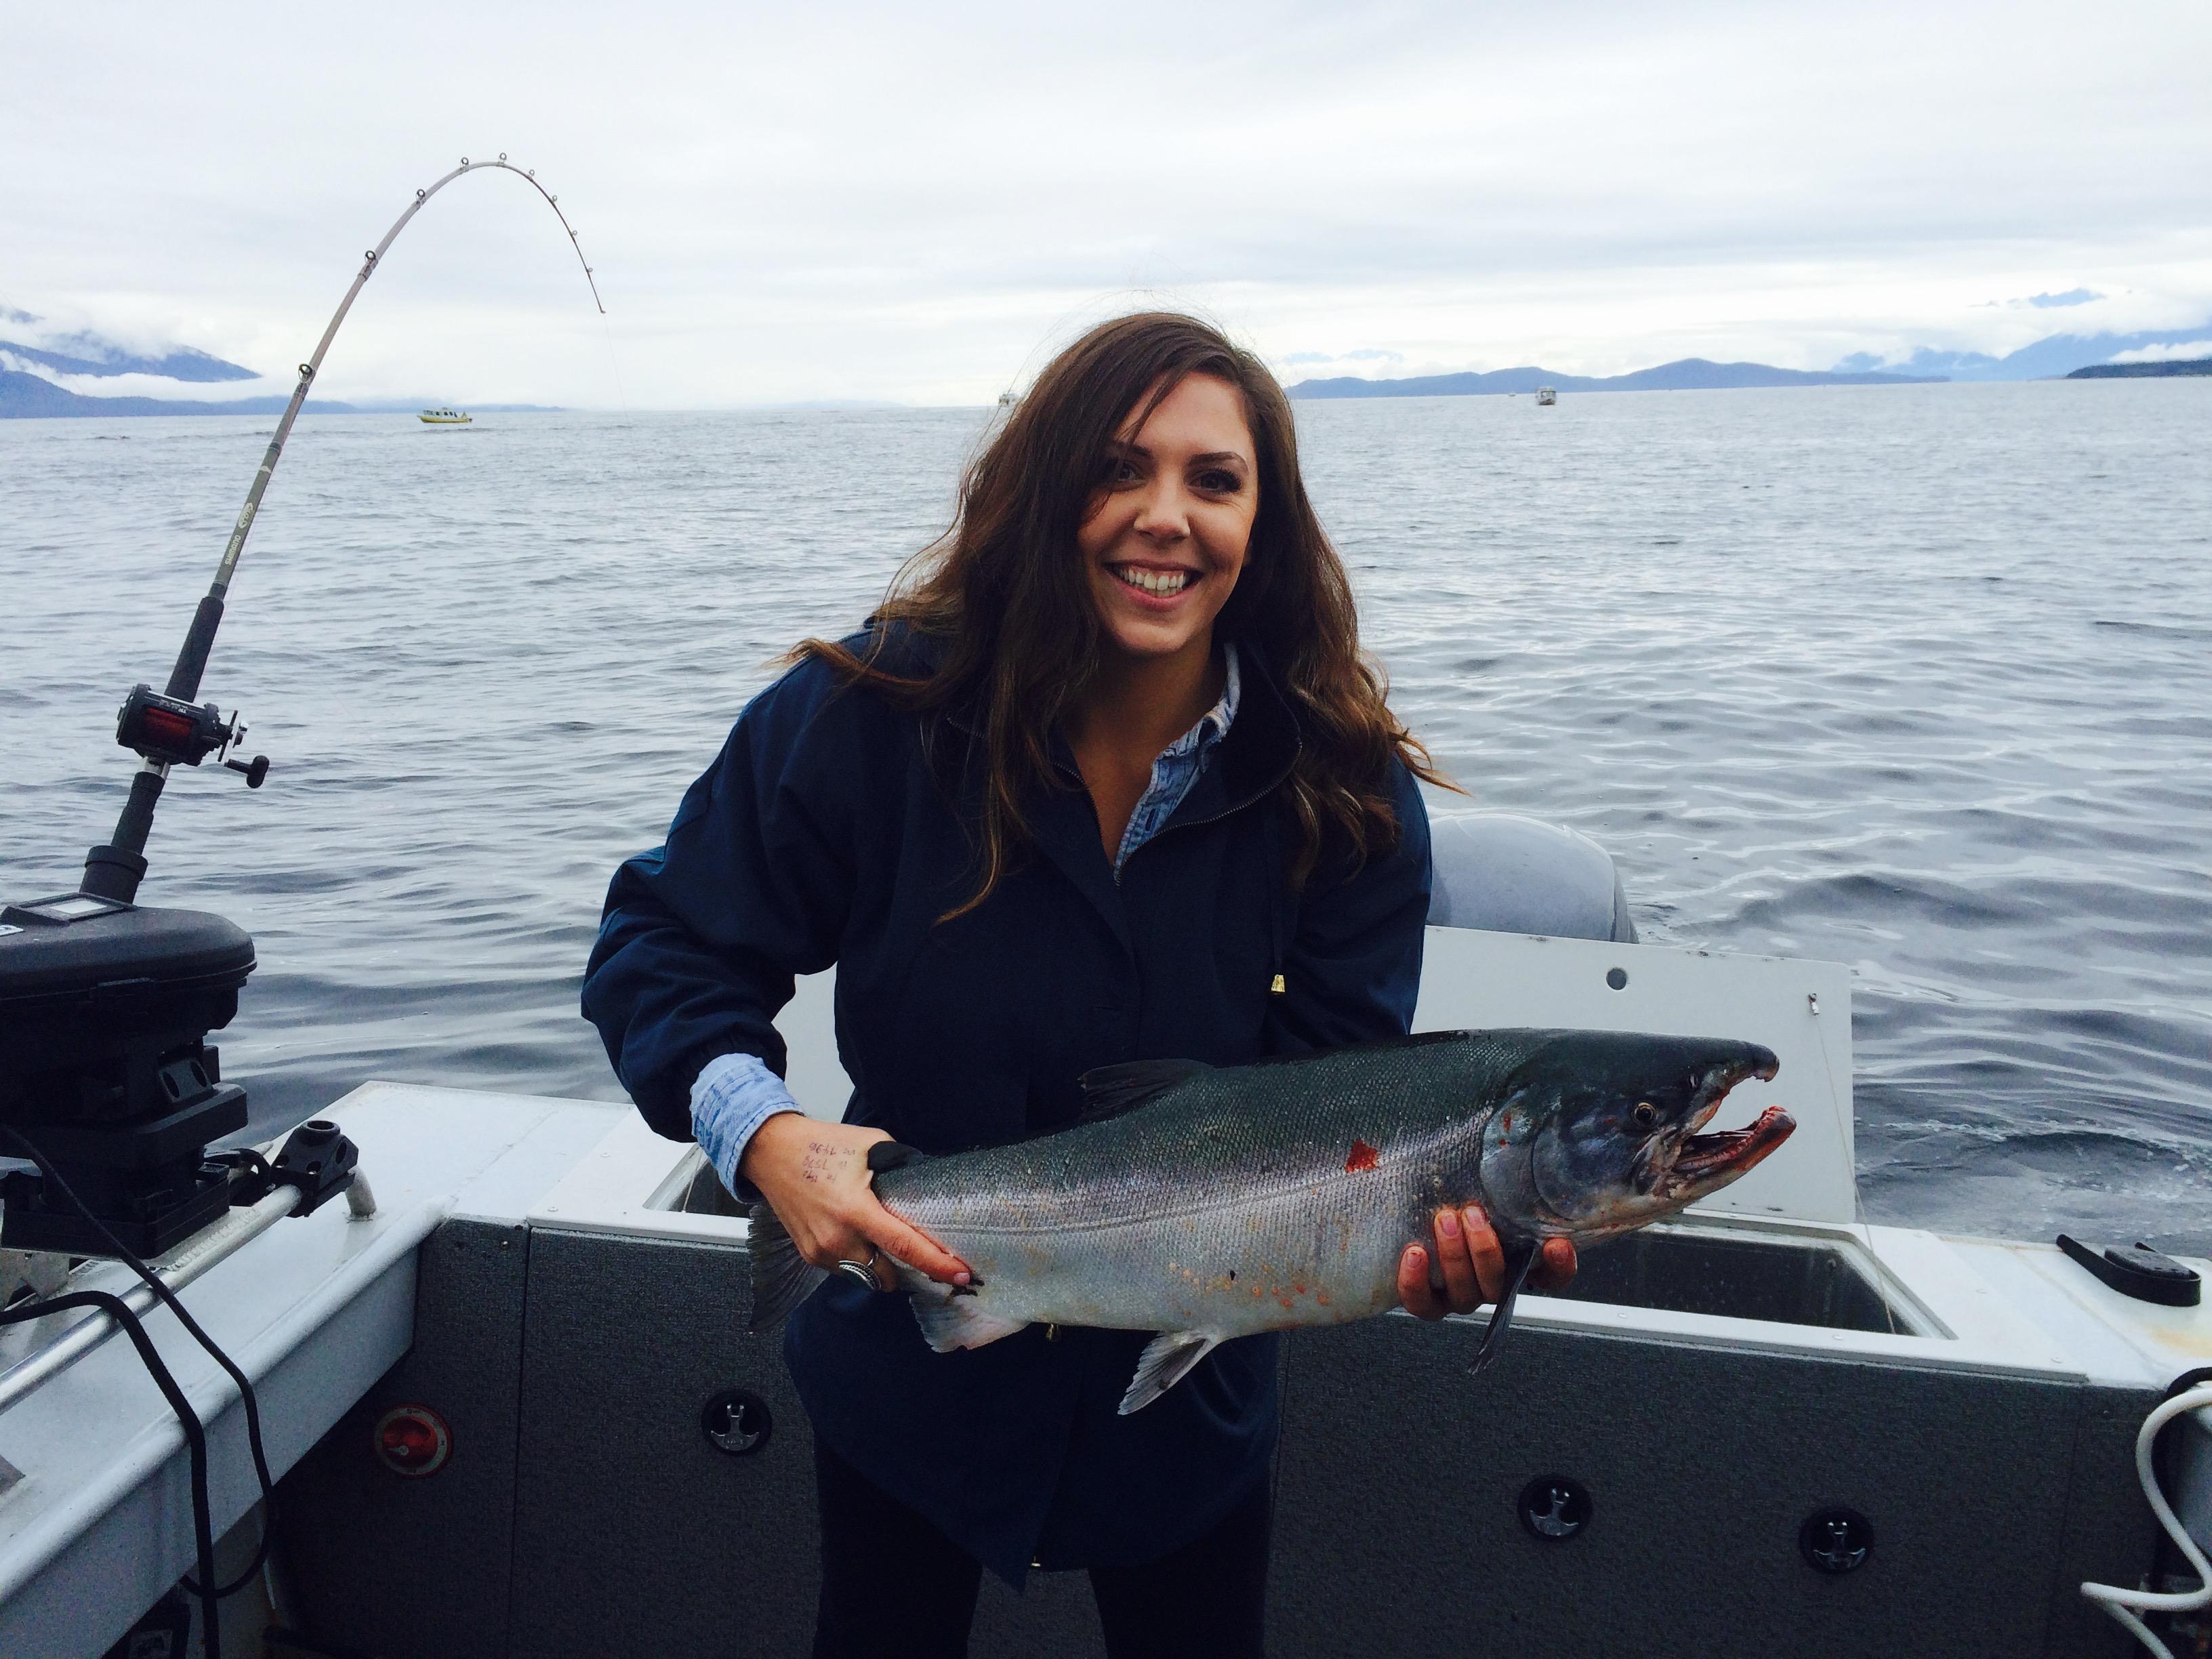 Juneau fishing lost in alaska adventures for Juneau fishing charters